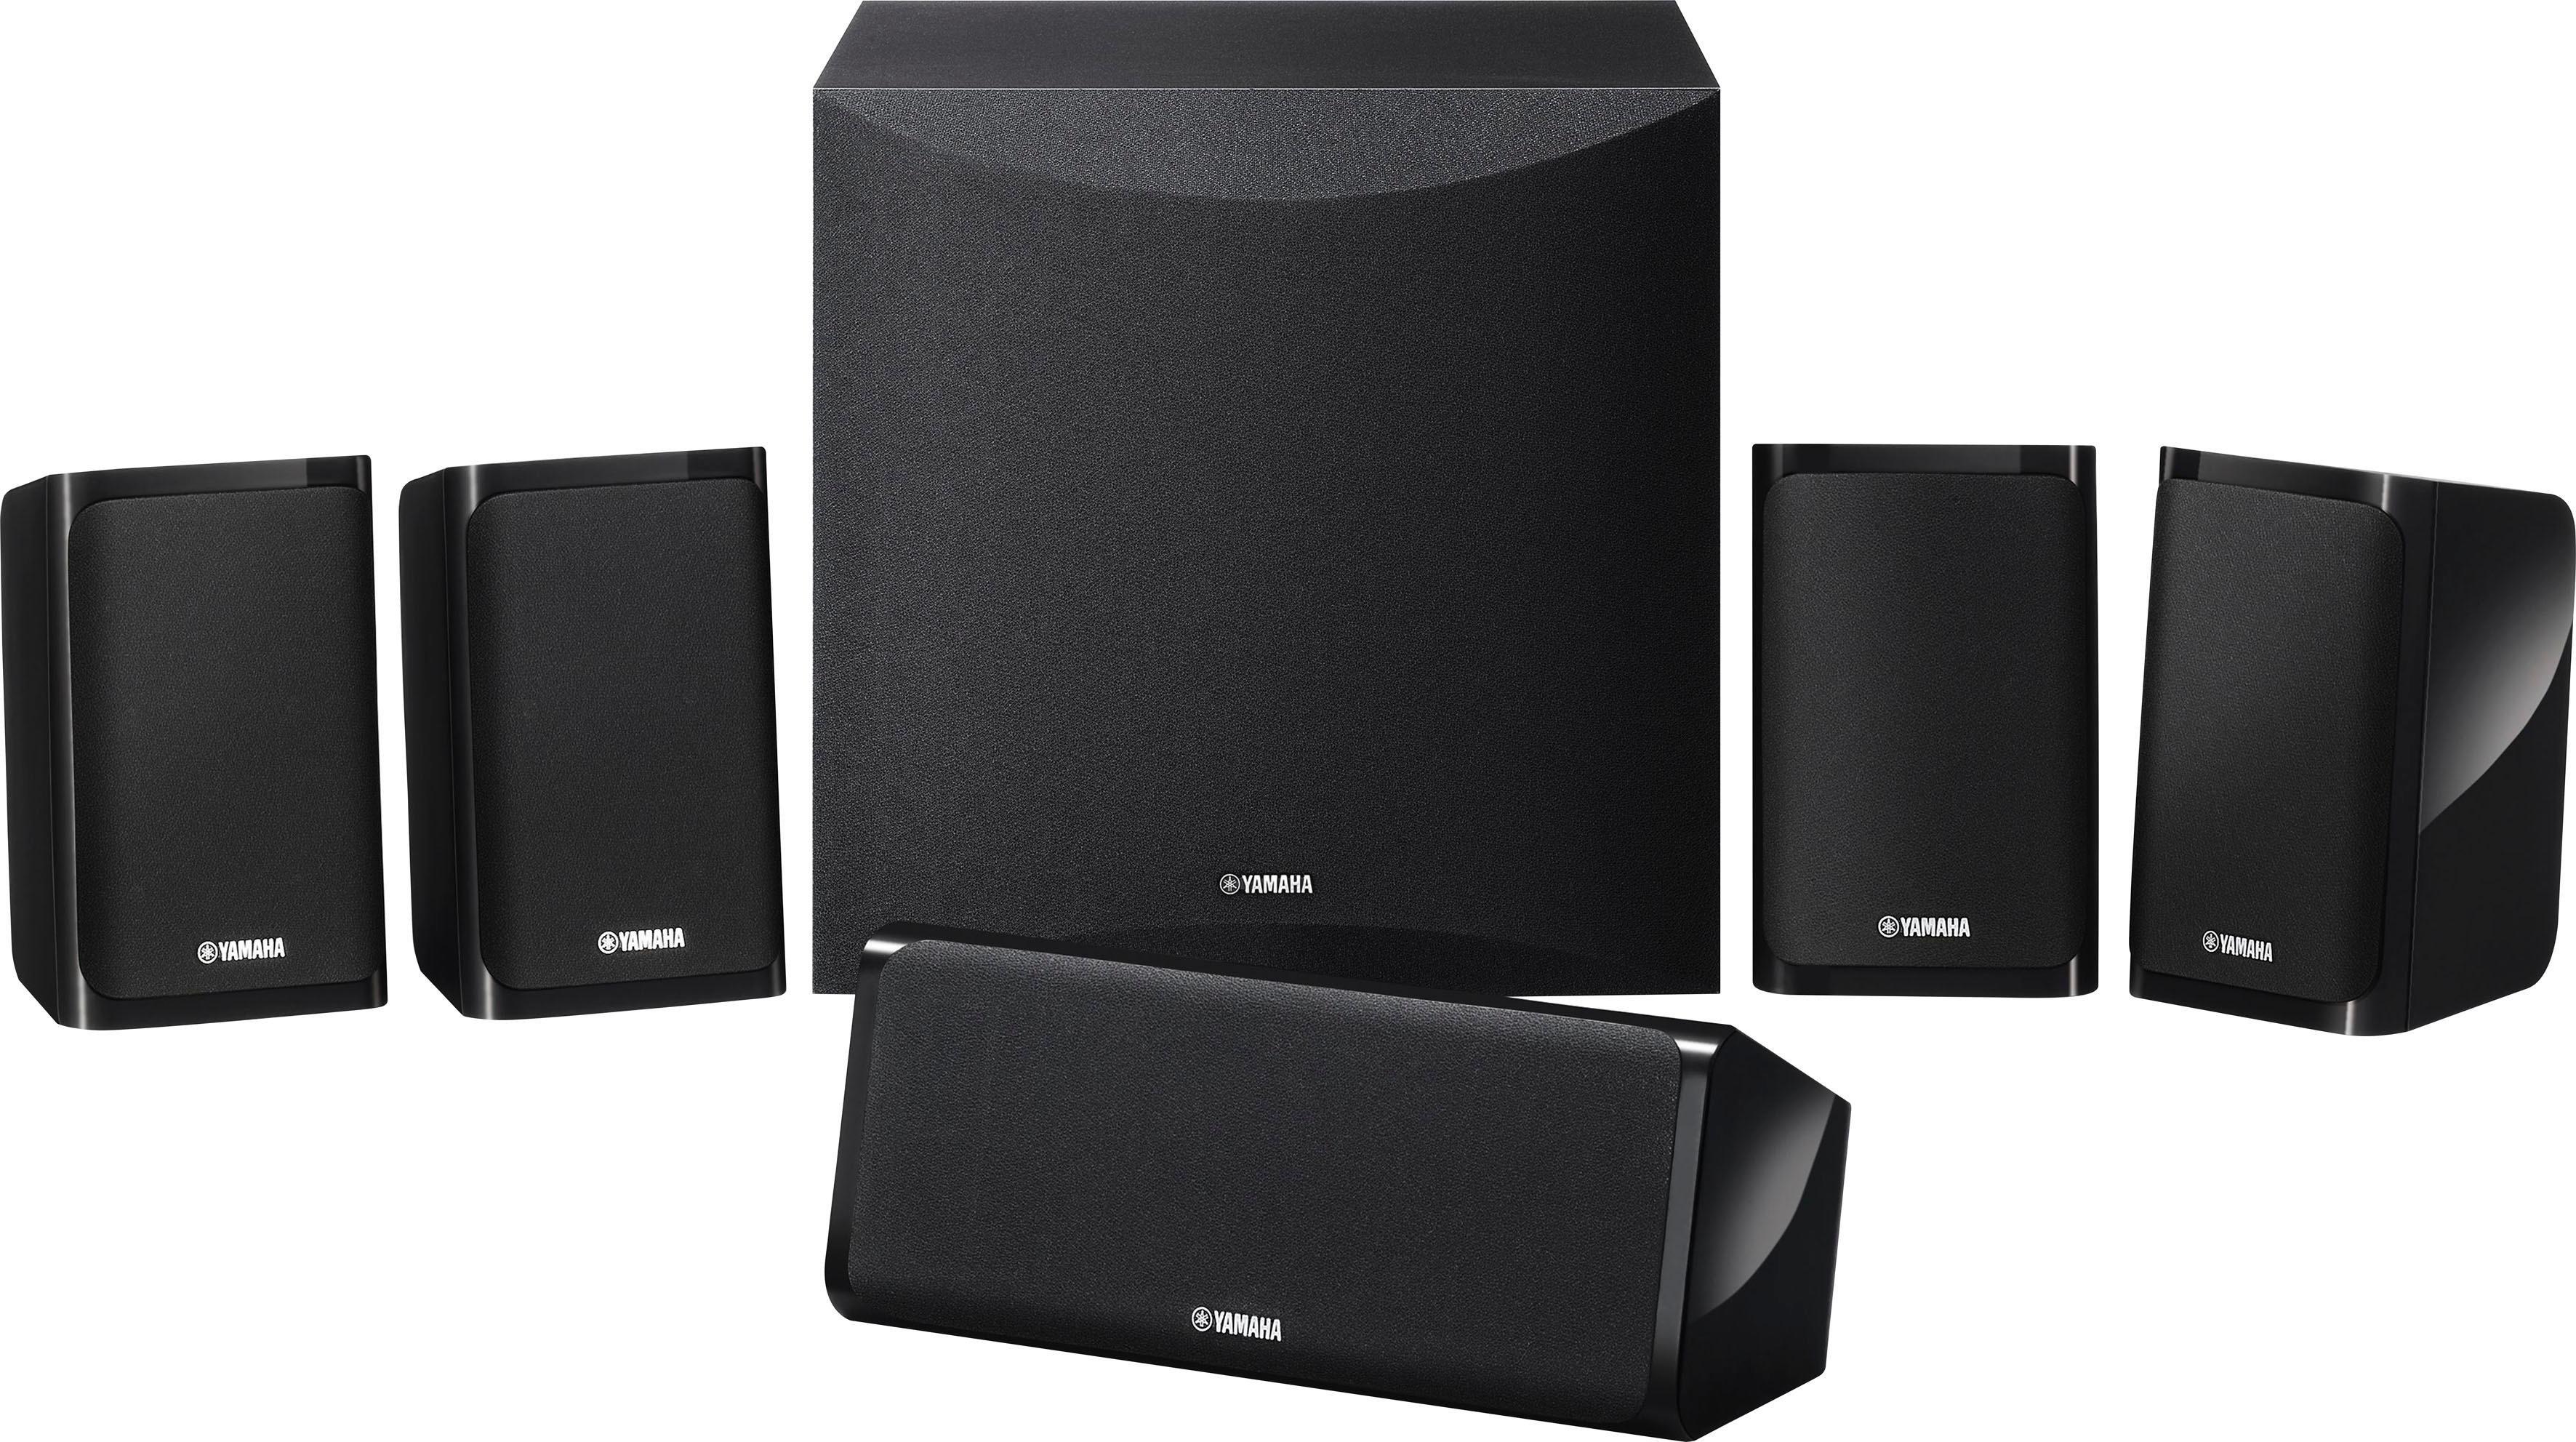 Yamaha »NS-P41« 5.1 luidsprekersysteem (200 W) - verschillende betaalmethodes